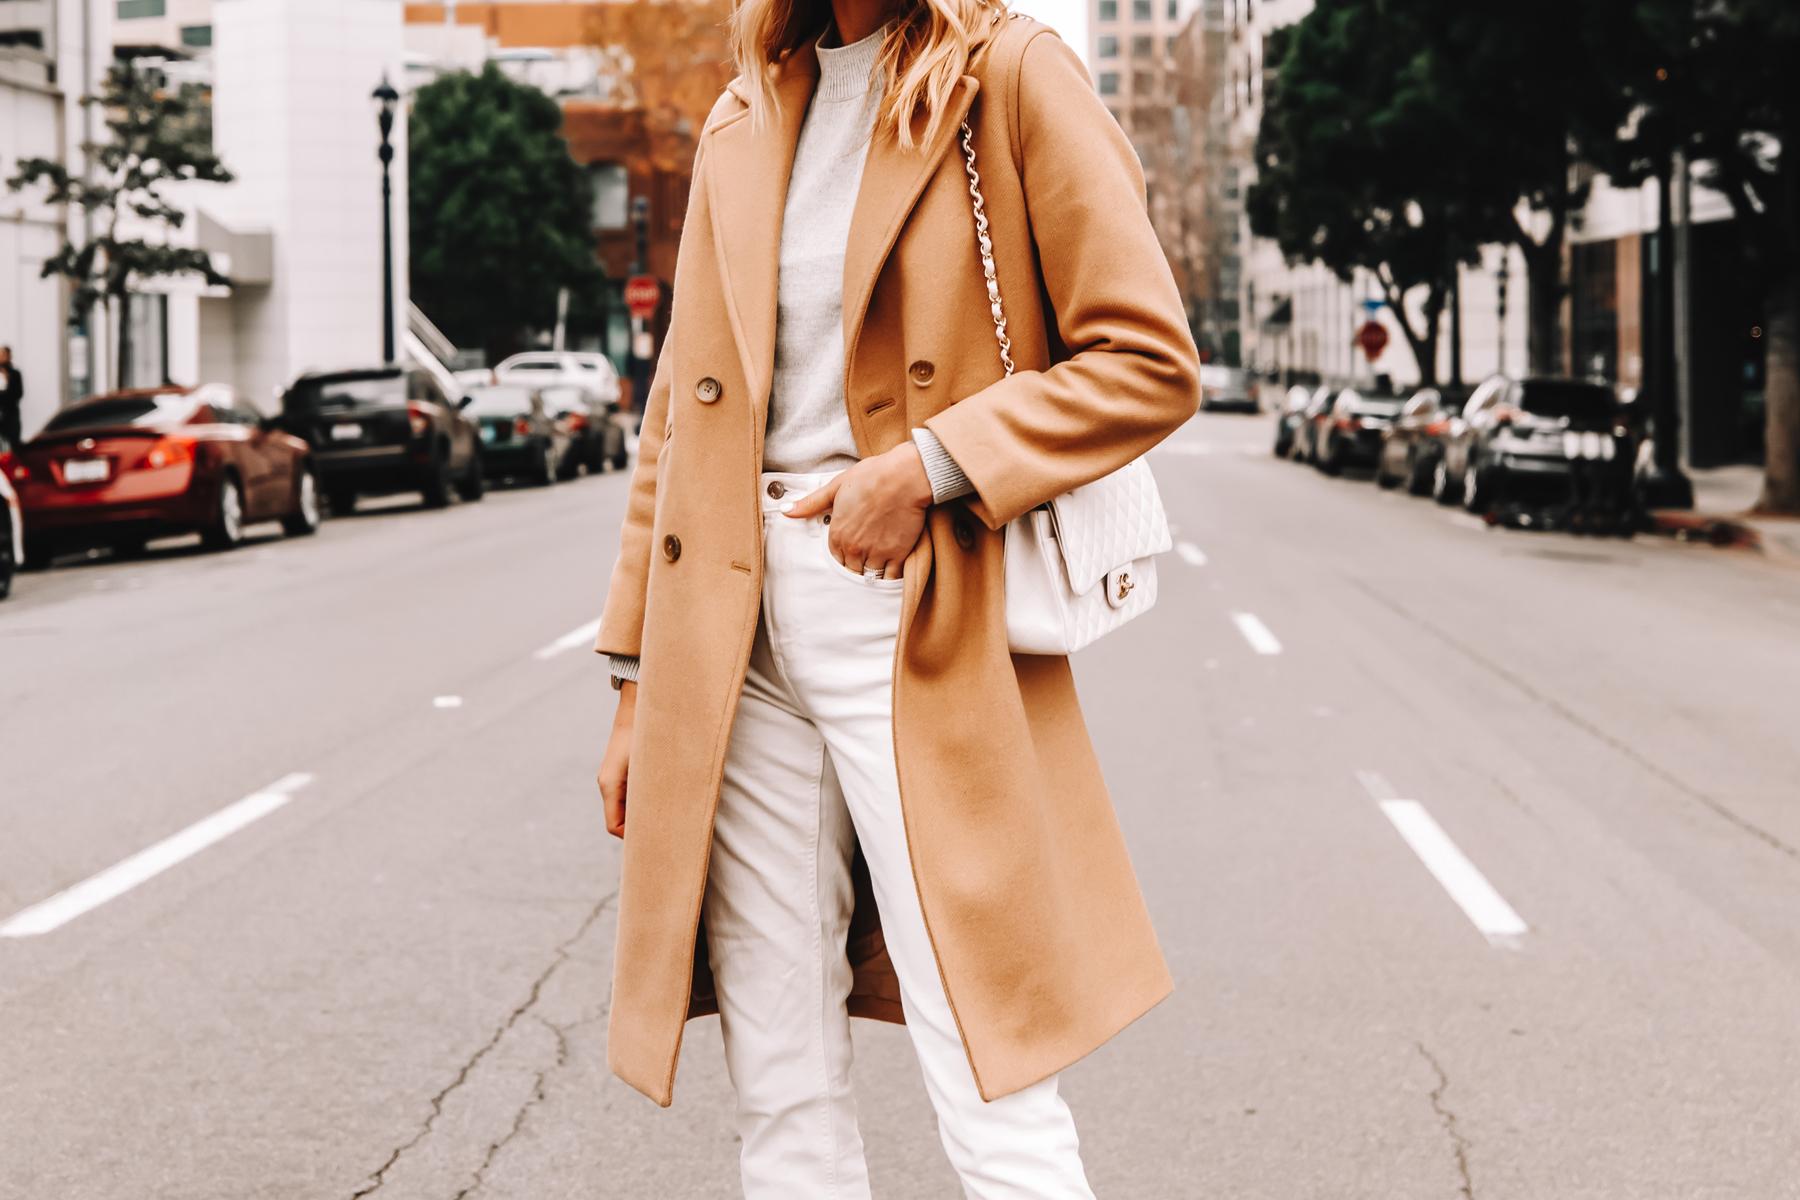 Fashion Jackson Wearing Everlane Camel Coat Grey Sweater White Jeans Nude Pumps White Chanel Handbag 1